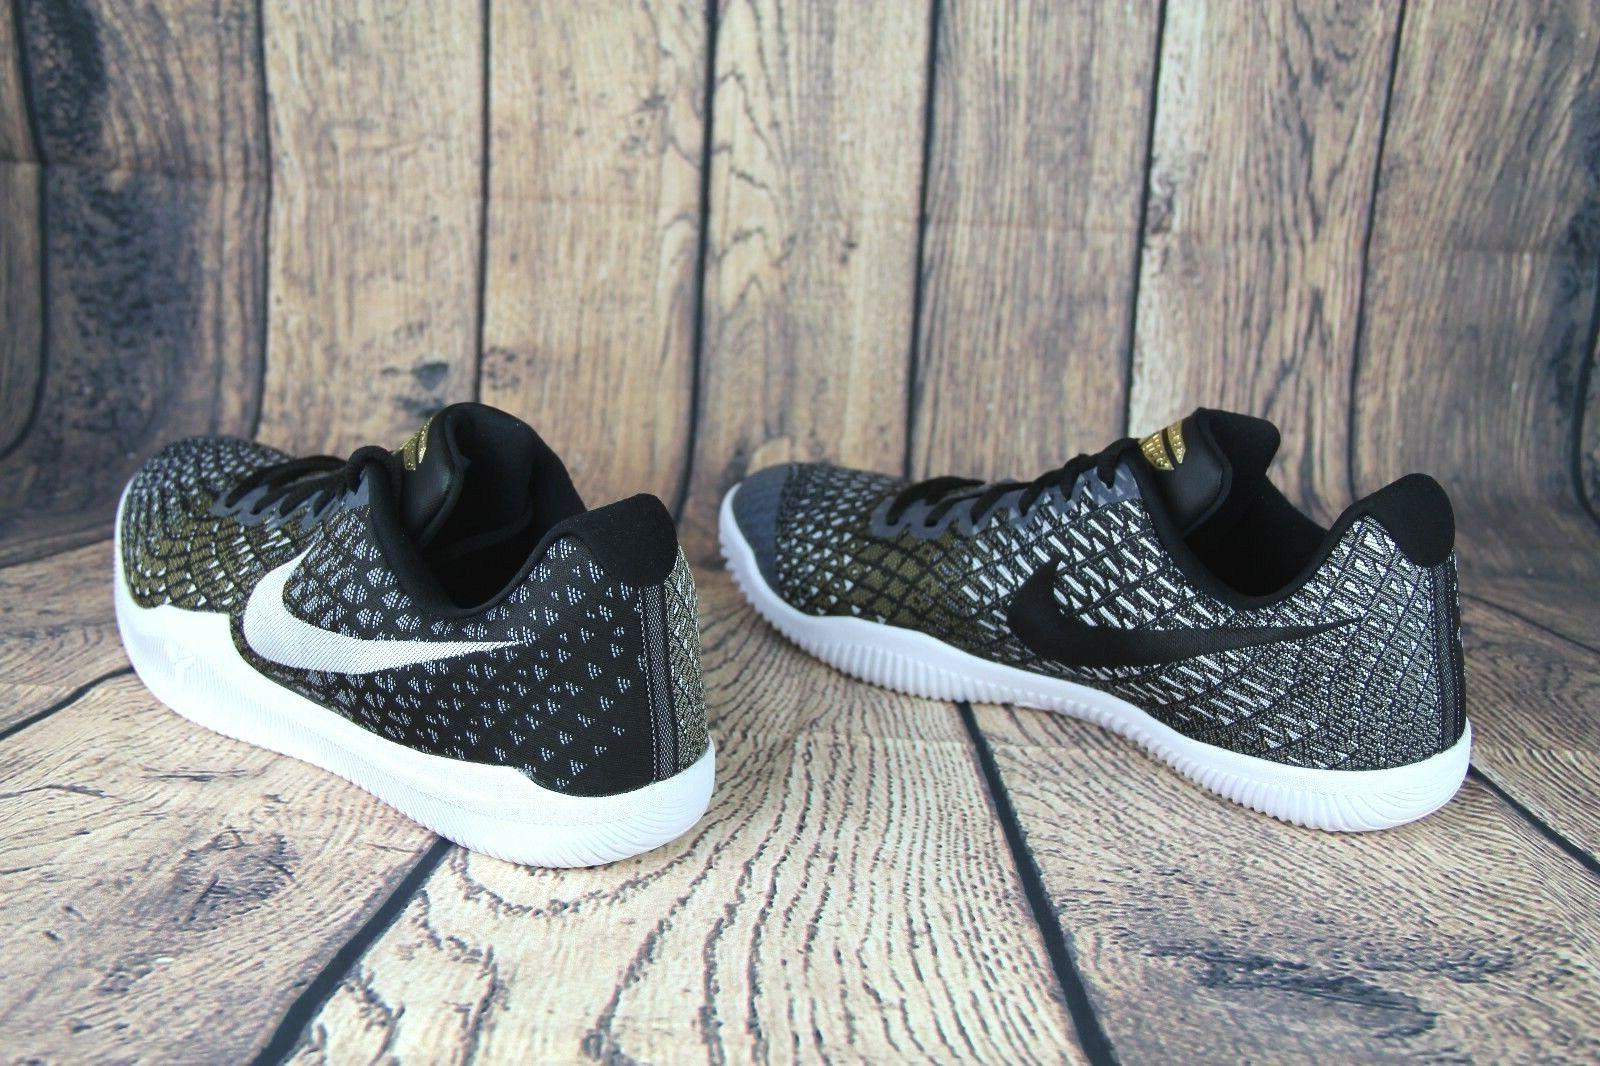 Nike Mens Basketball Shoes 852473-010